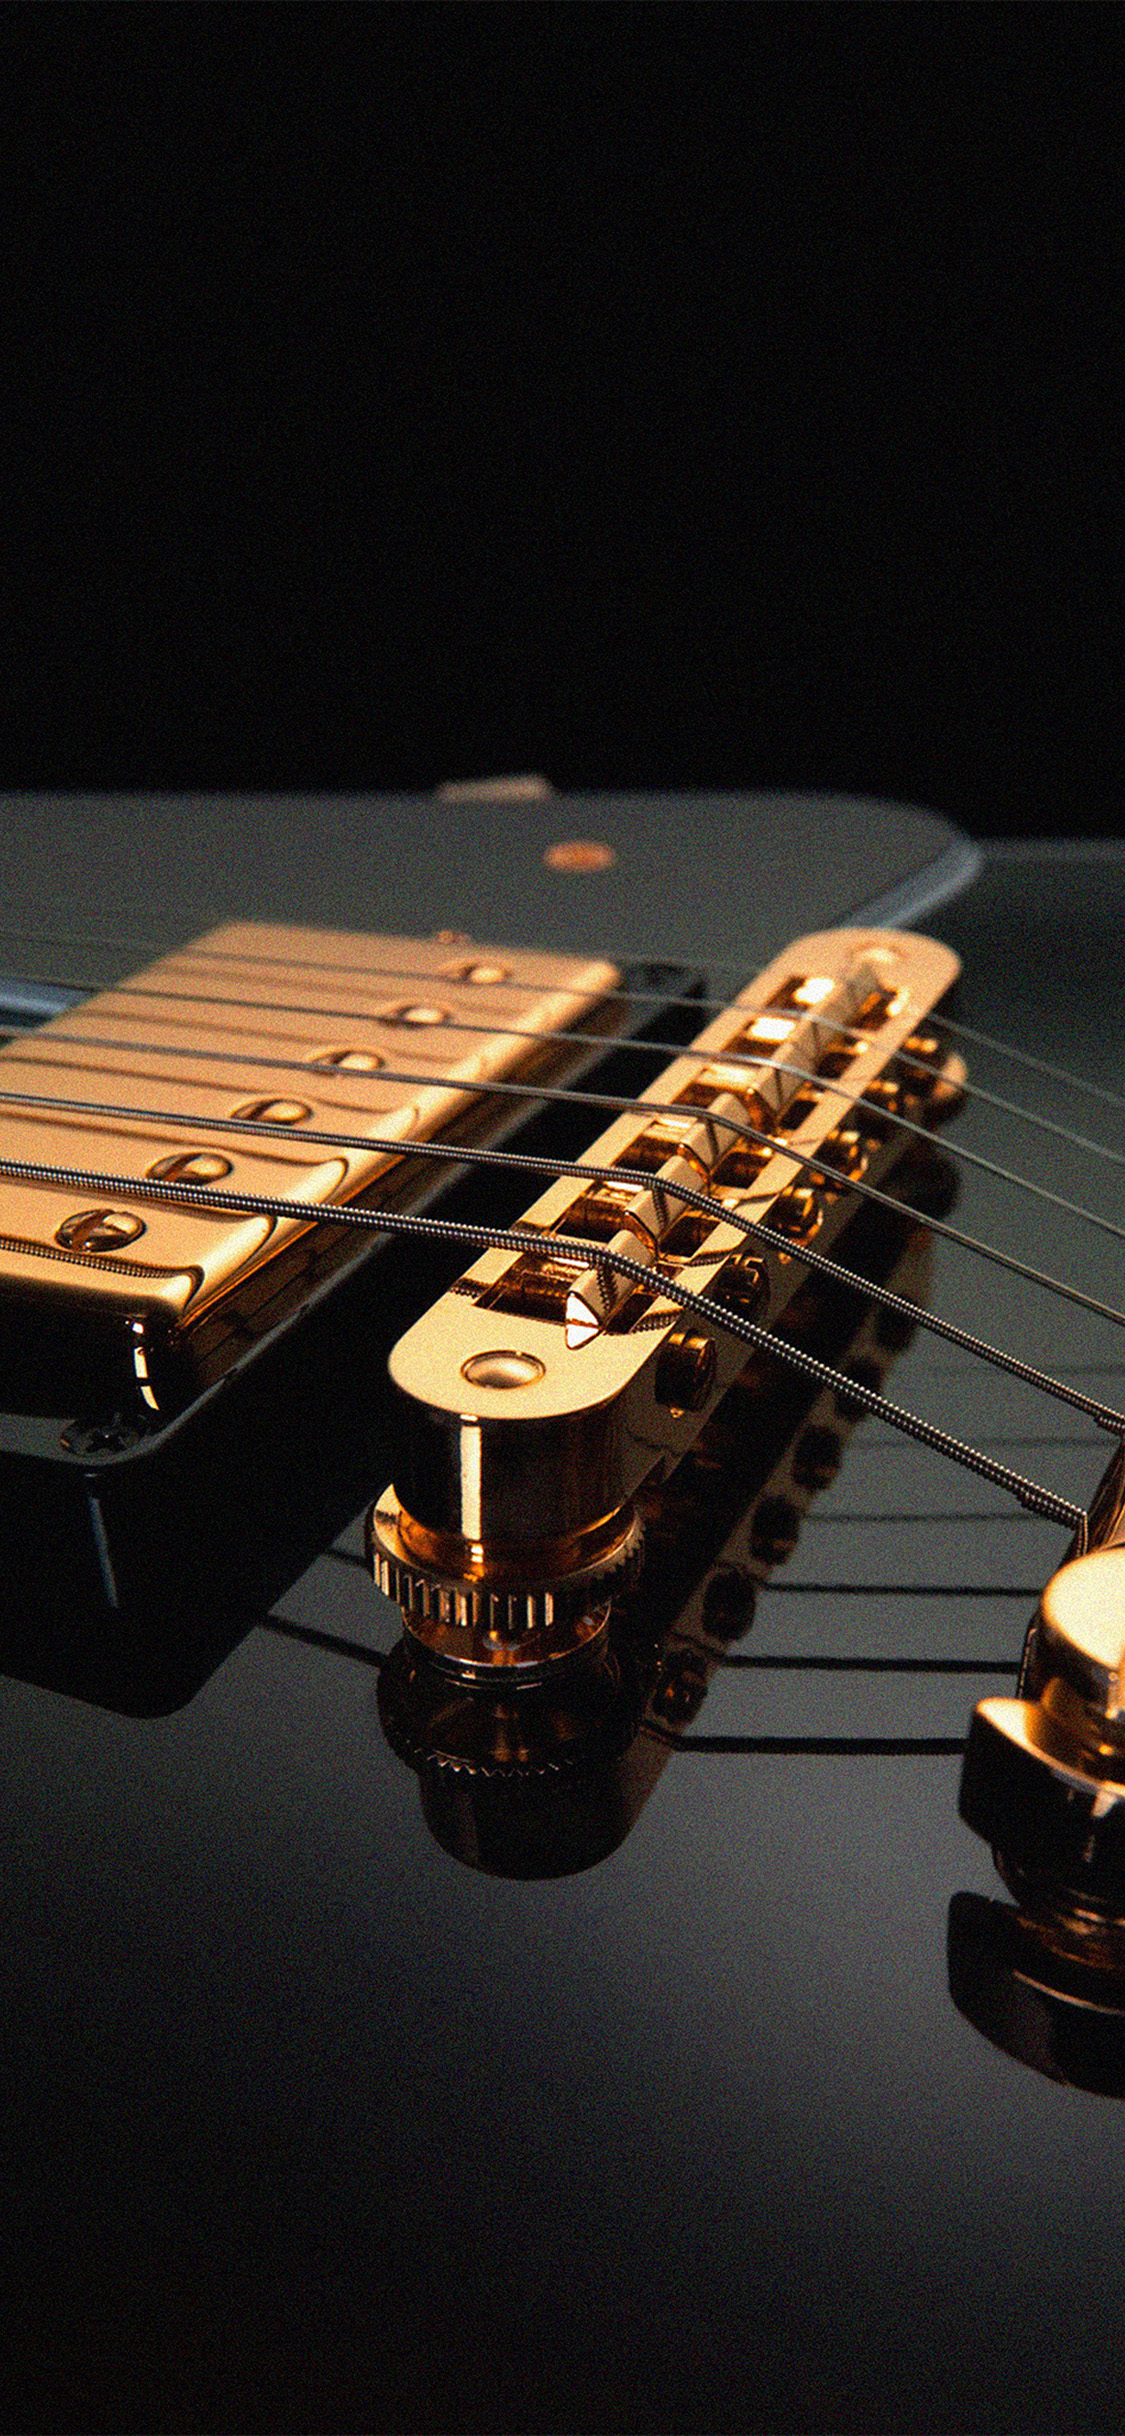 iPhonexpapers.com-Apple-iPhone-wallpaper-bg52-guitar-electric-black-music-art